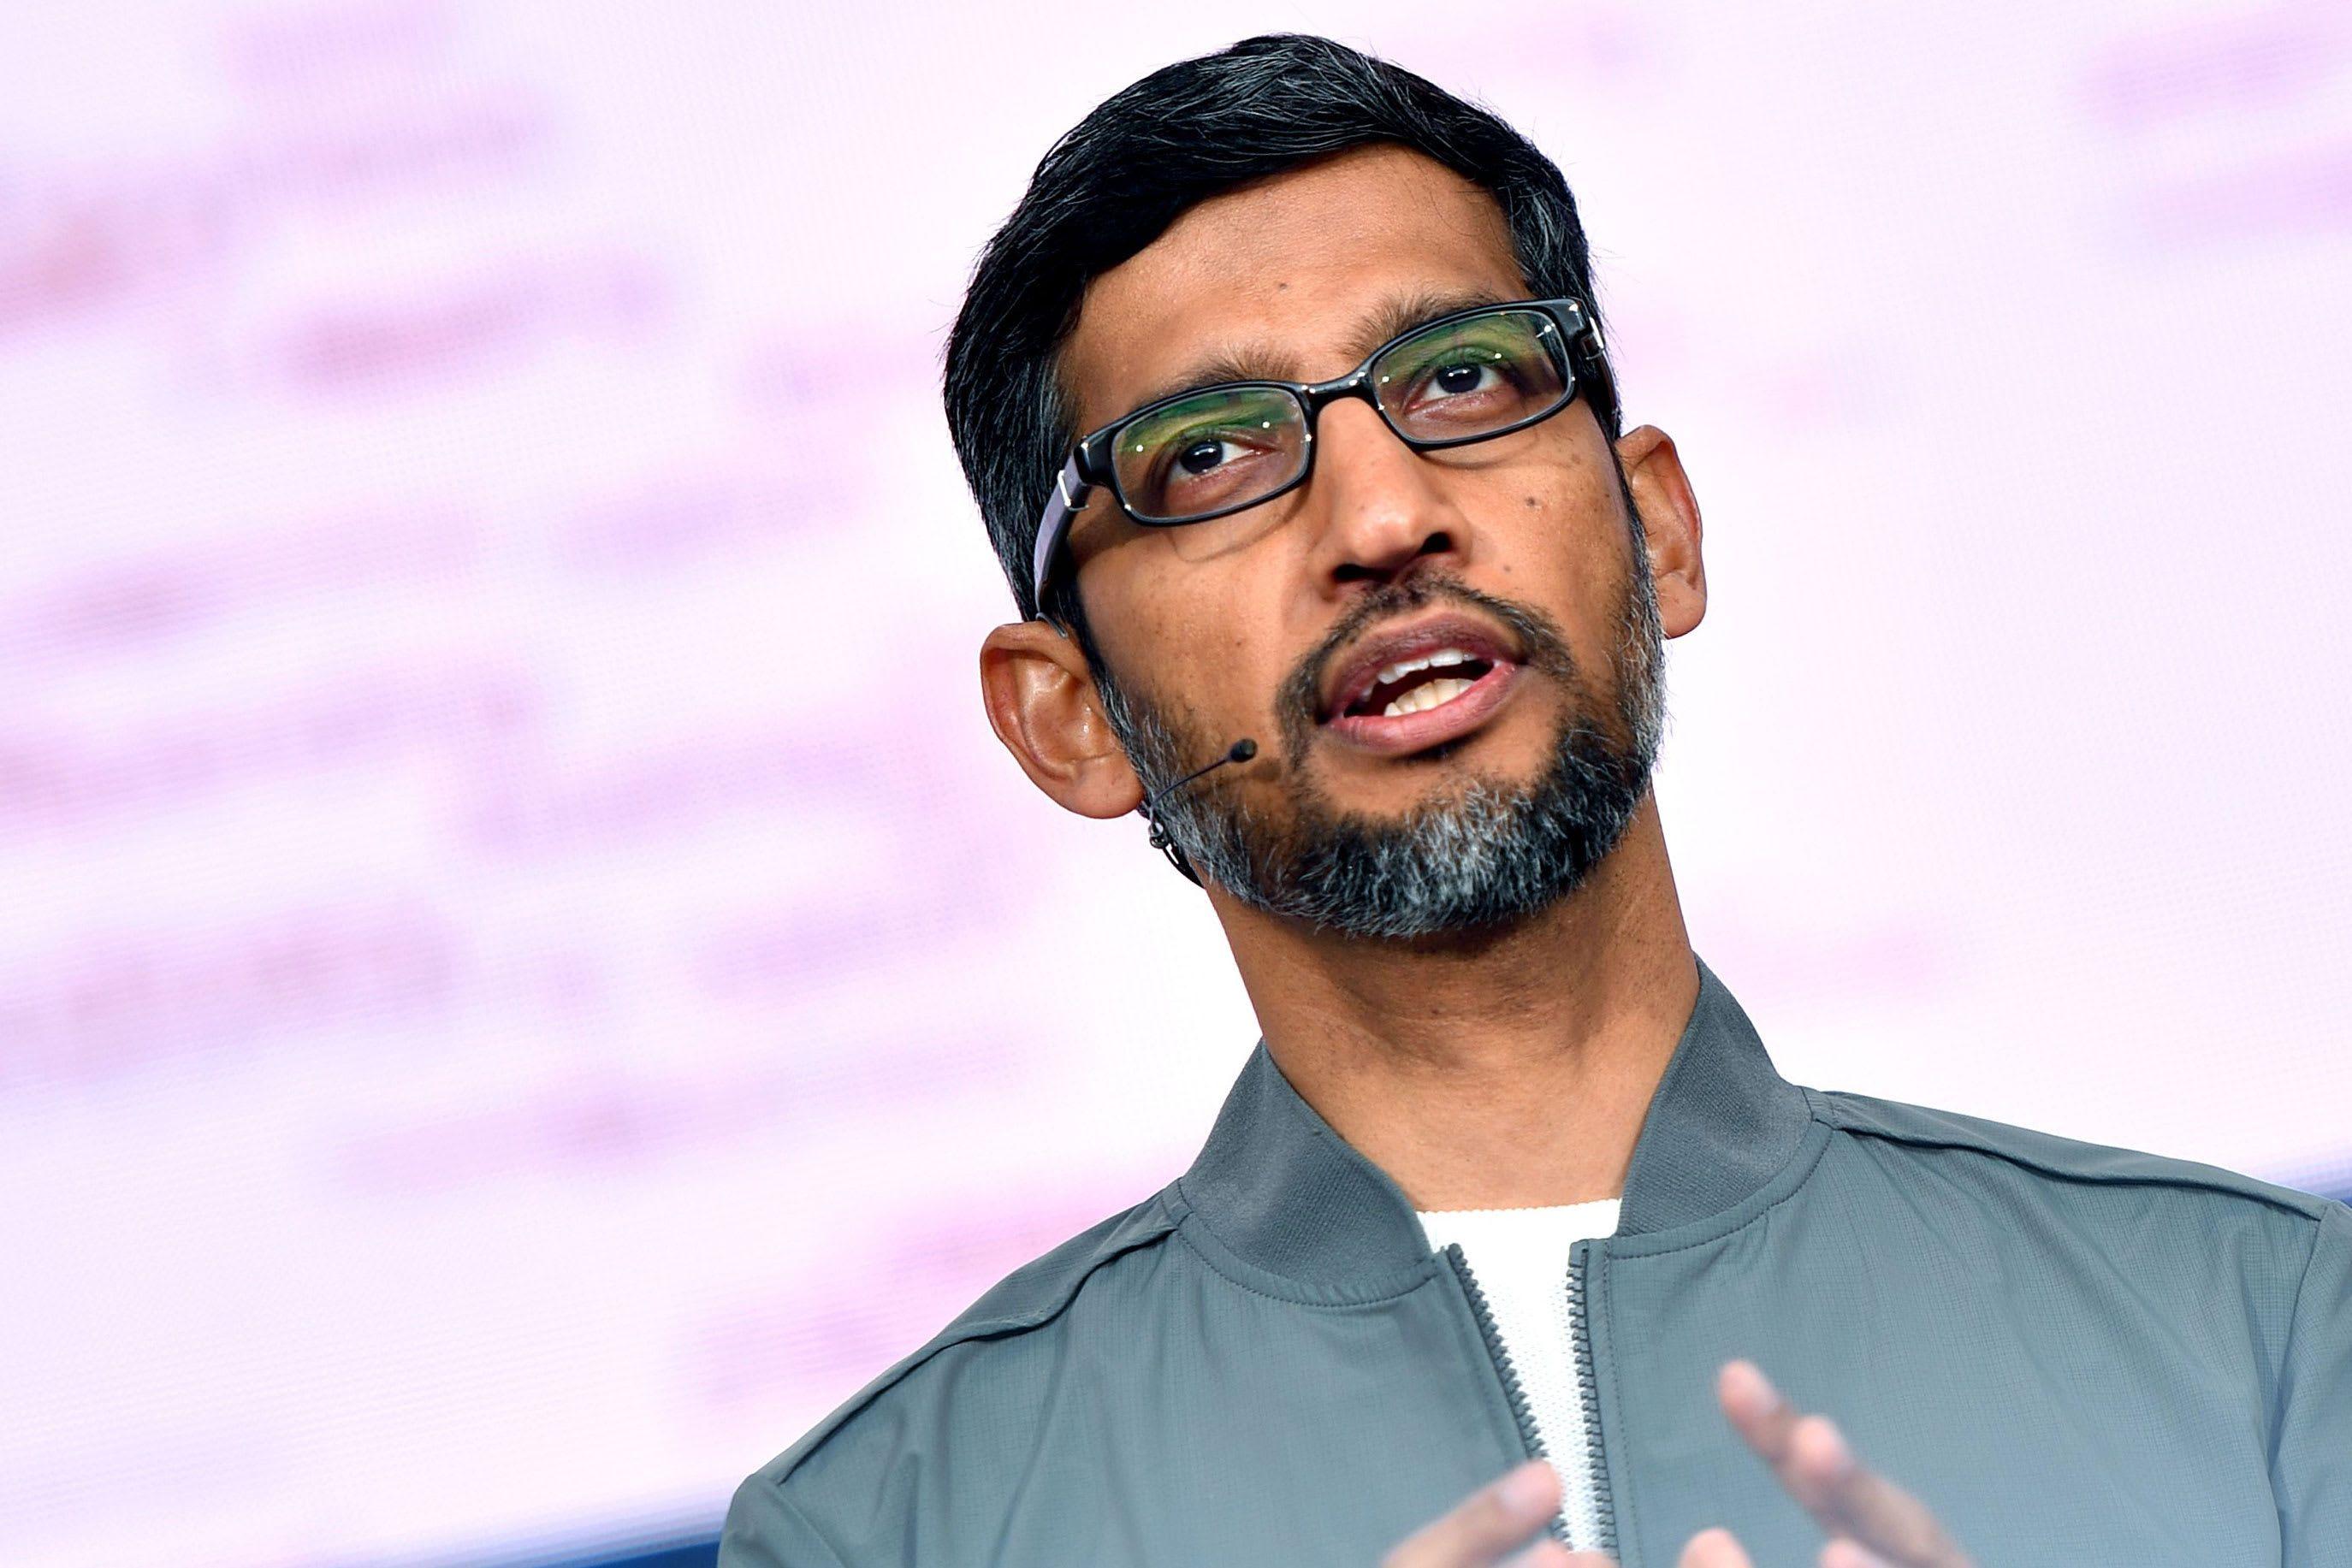 States' massive Google antitrust probe will expand into